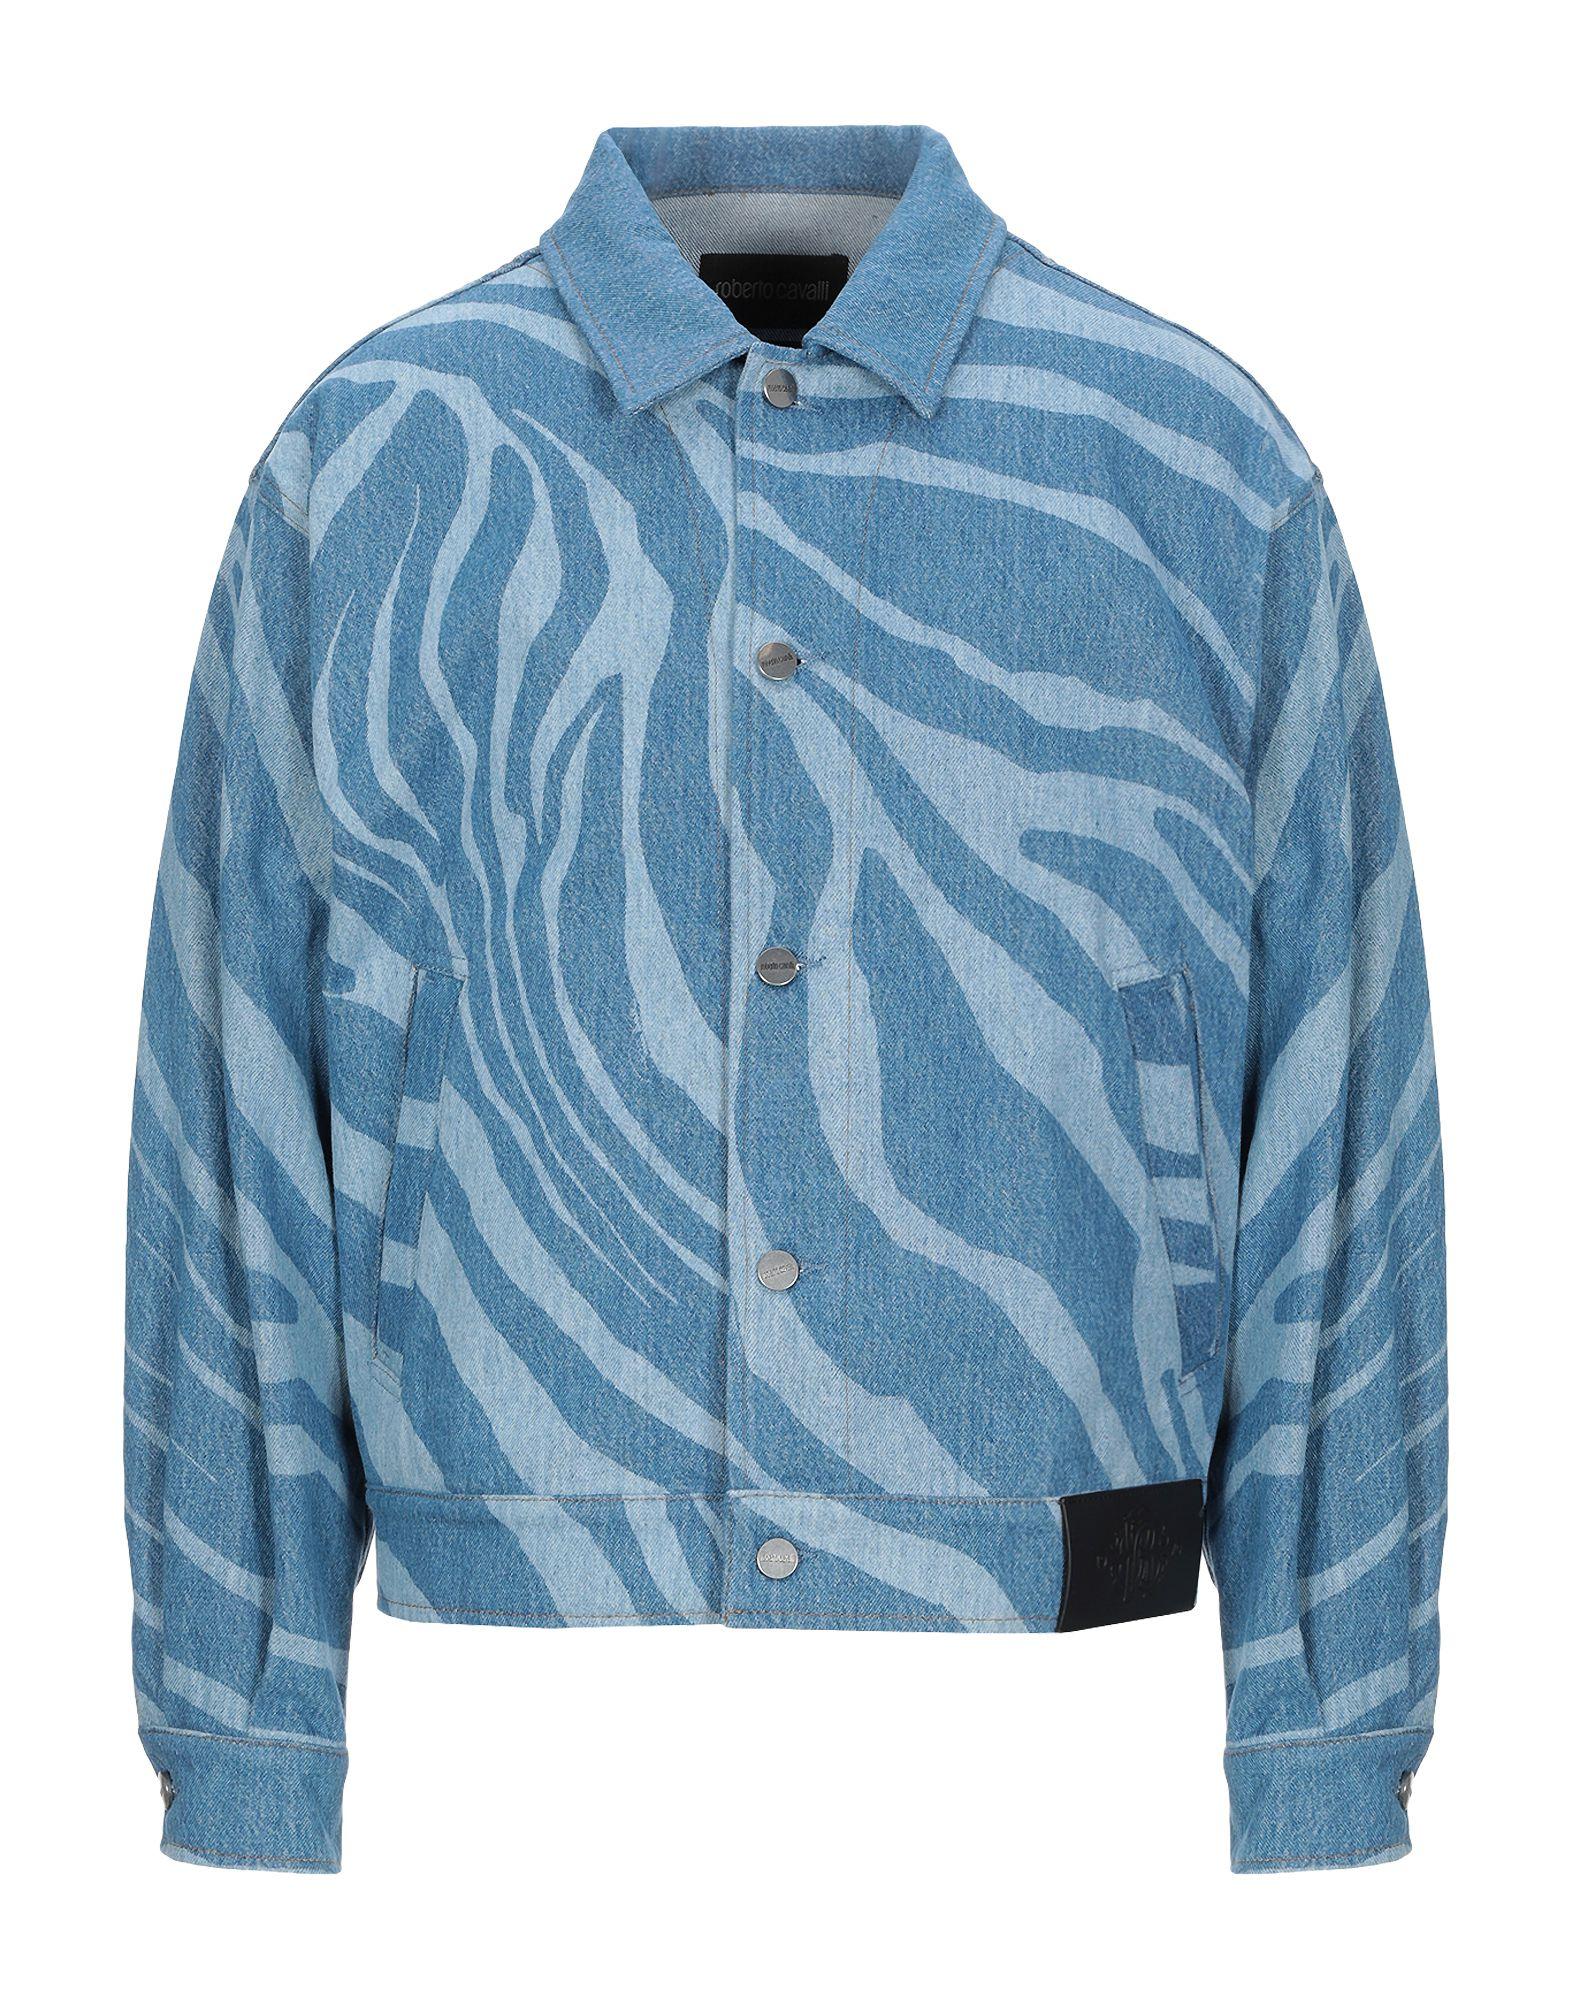 ROBERTO CAVALLI Джинсовая верхняя одежда just cavalli джинсовая верхняя одежда